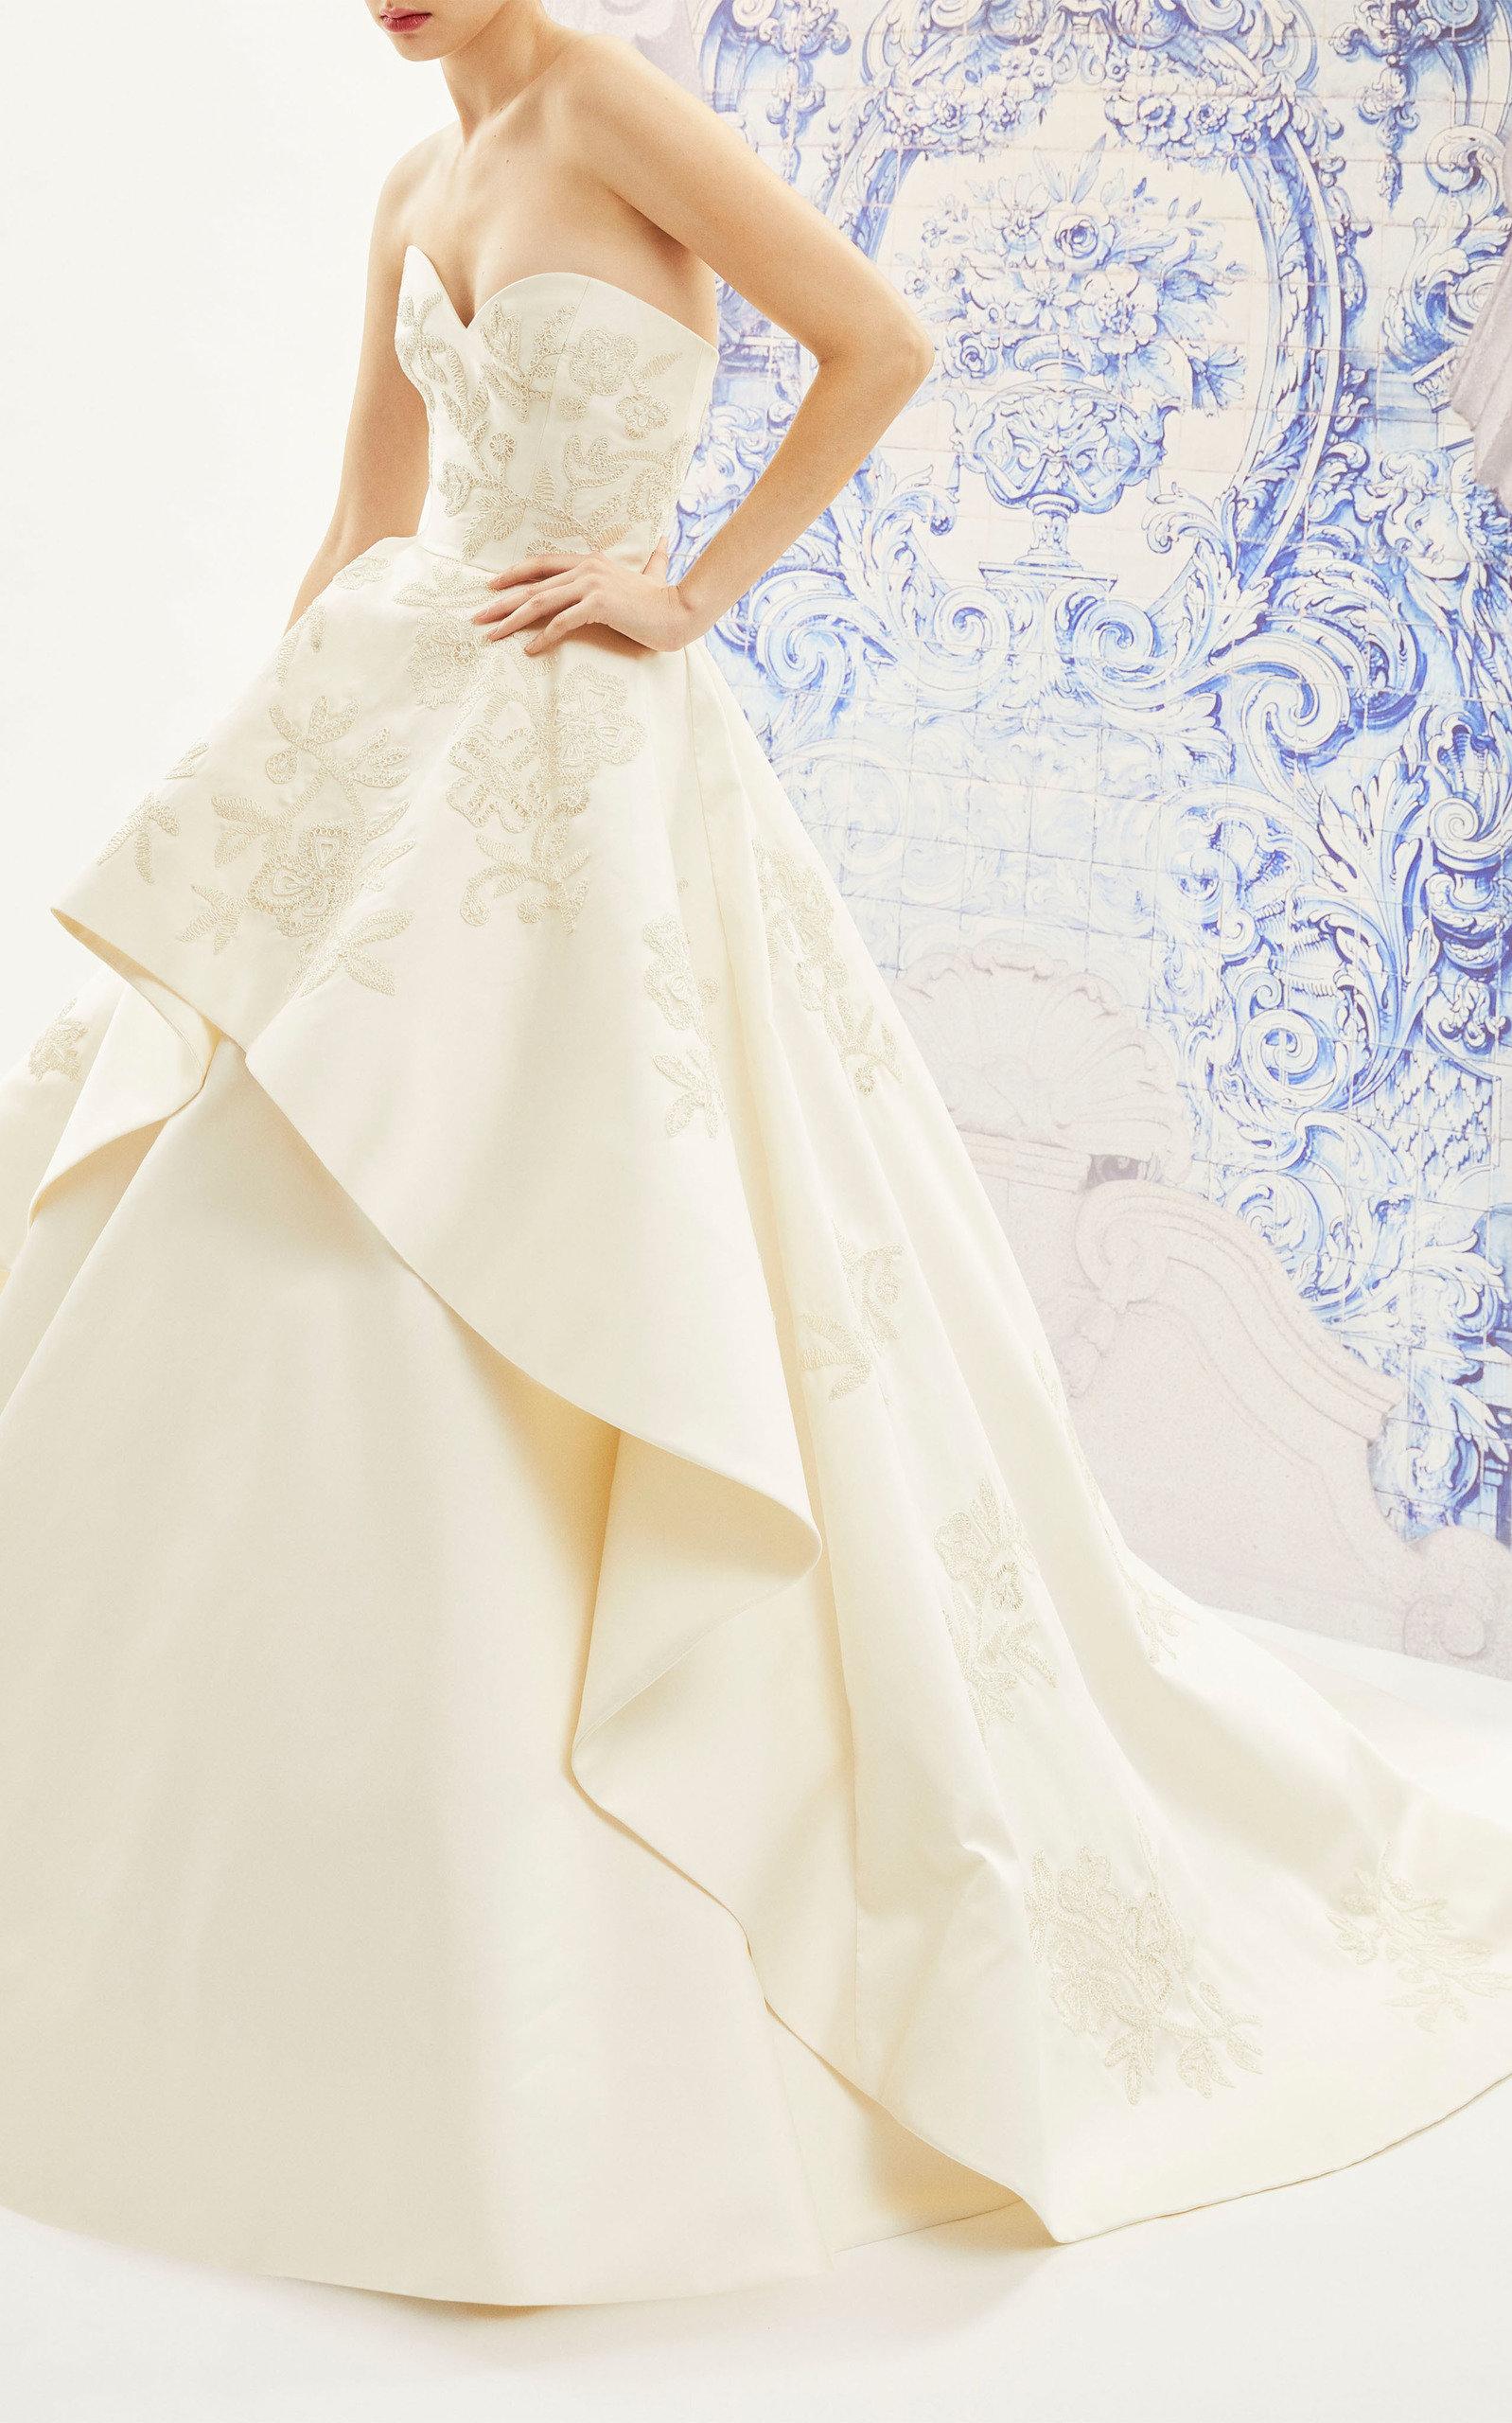 Buy Carolina Herrera Bridal Ivonne Strapless Silk Ballgown With Floral Emb online, shop Carolina Herrera Bridal at the best price